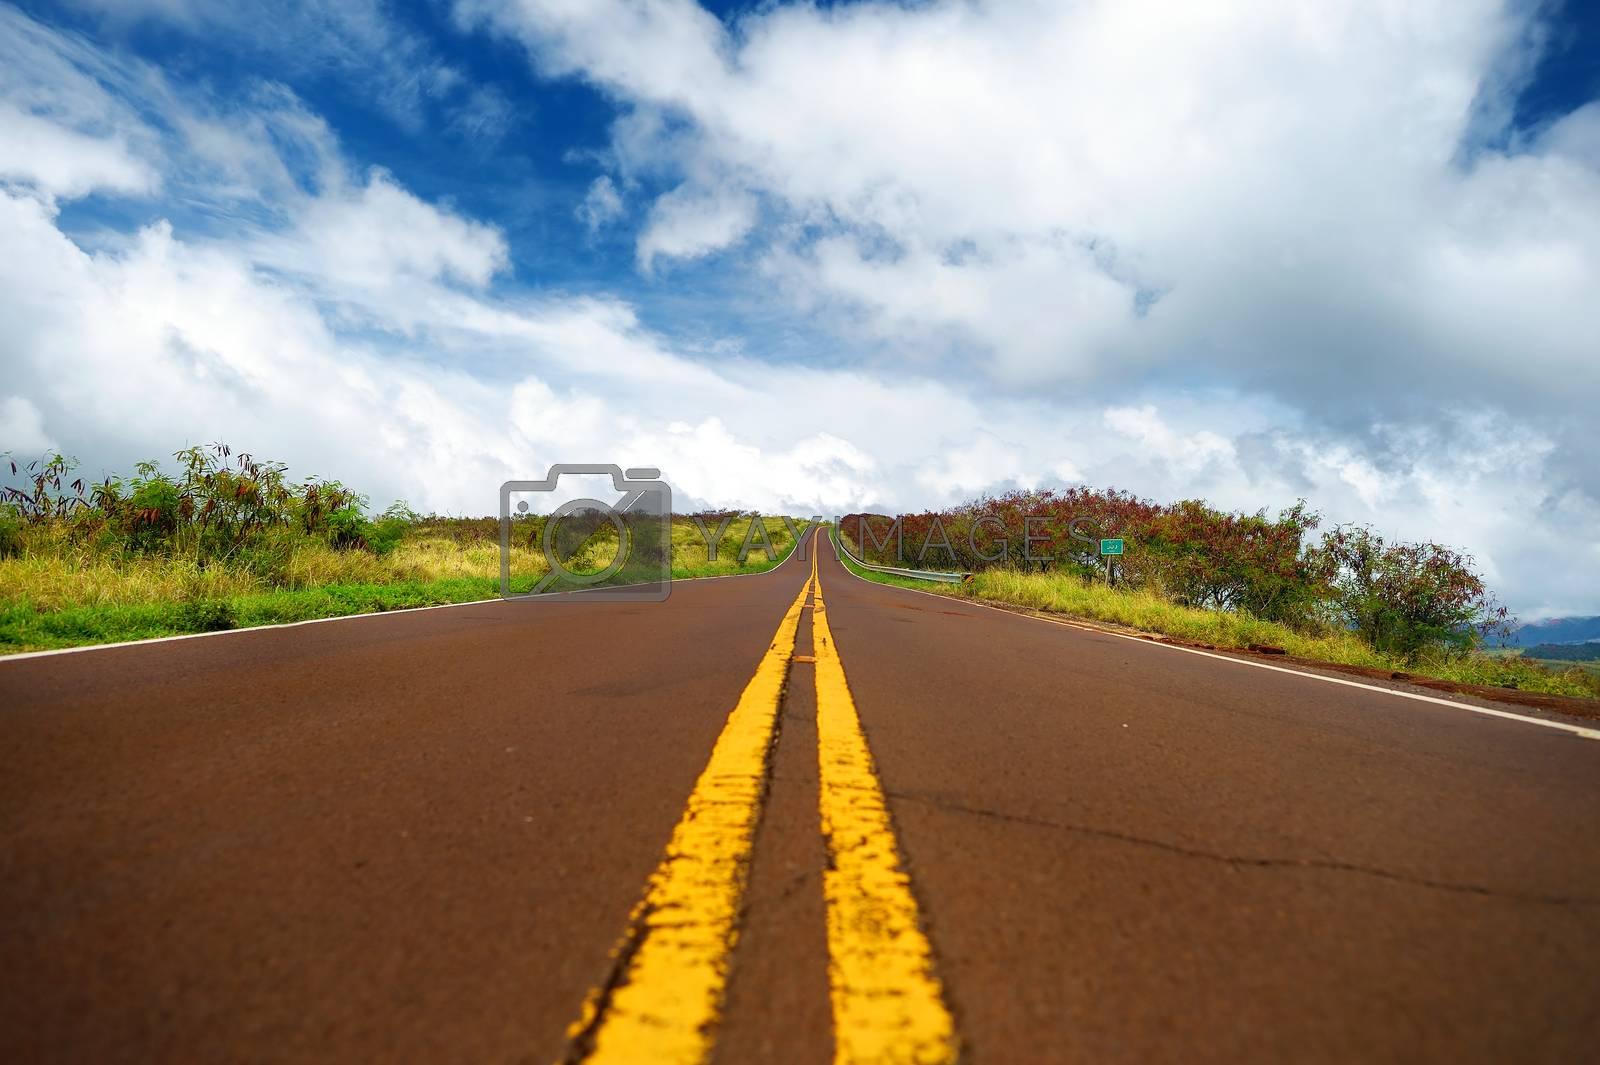 Serpentine road winding through the mountains on Kauai, Hawaii